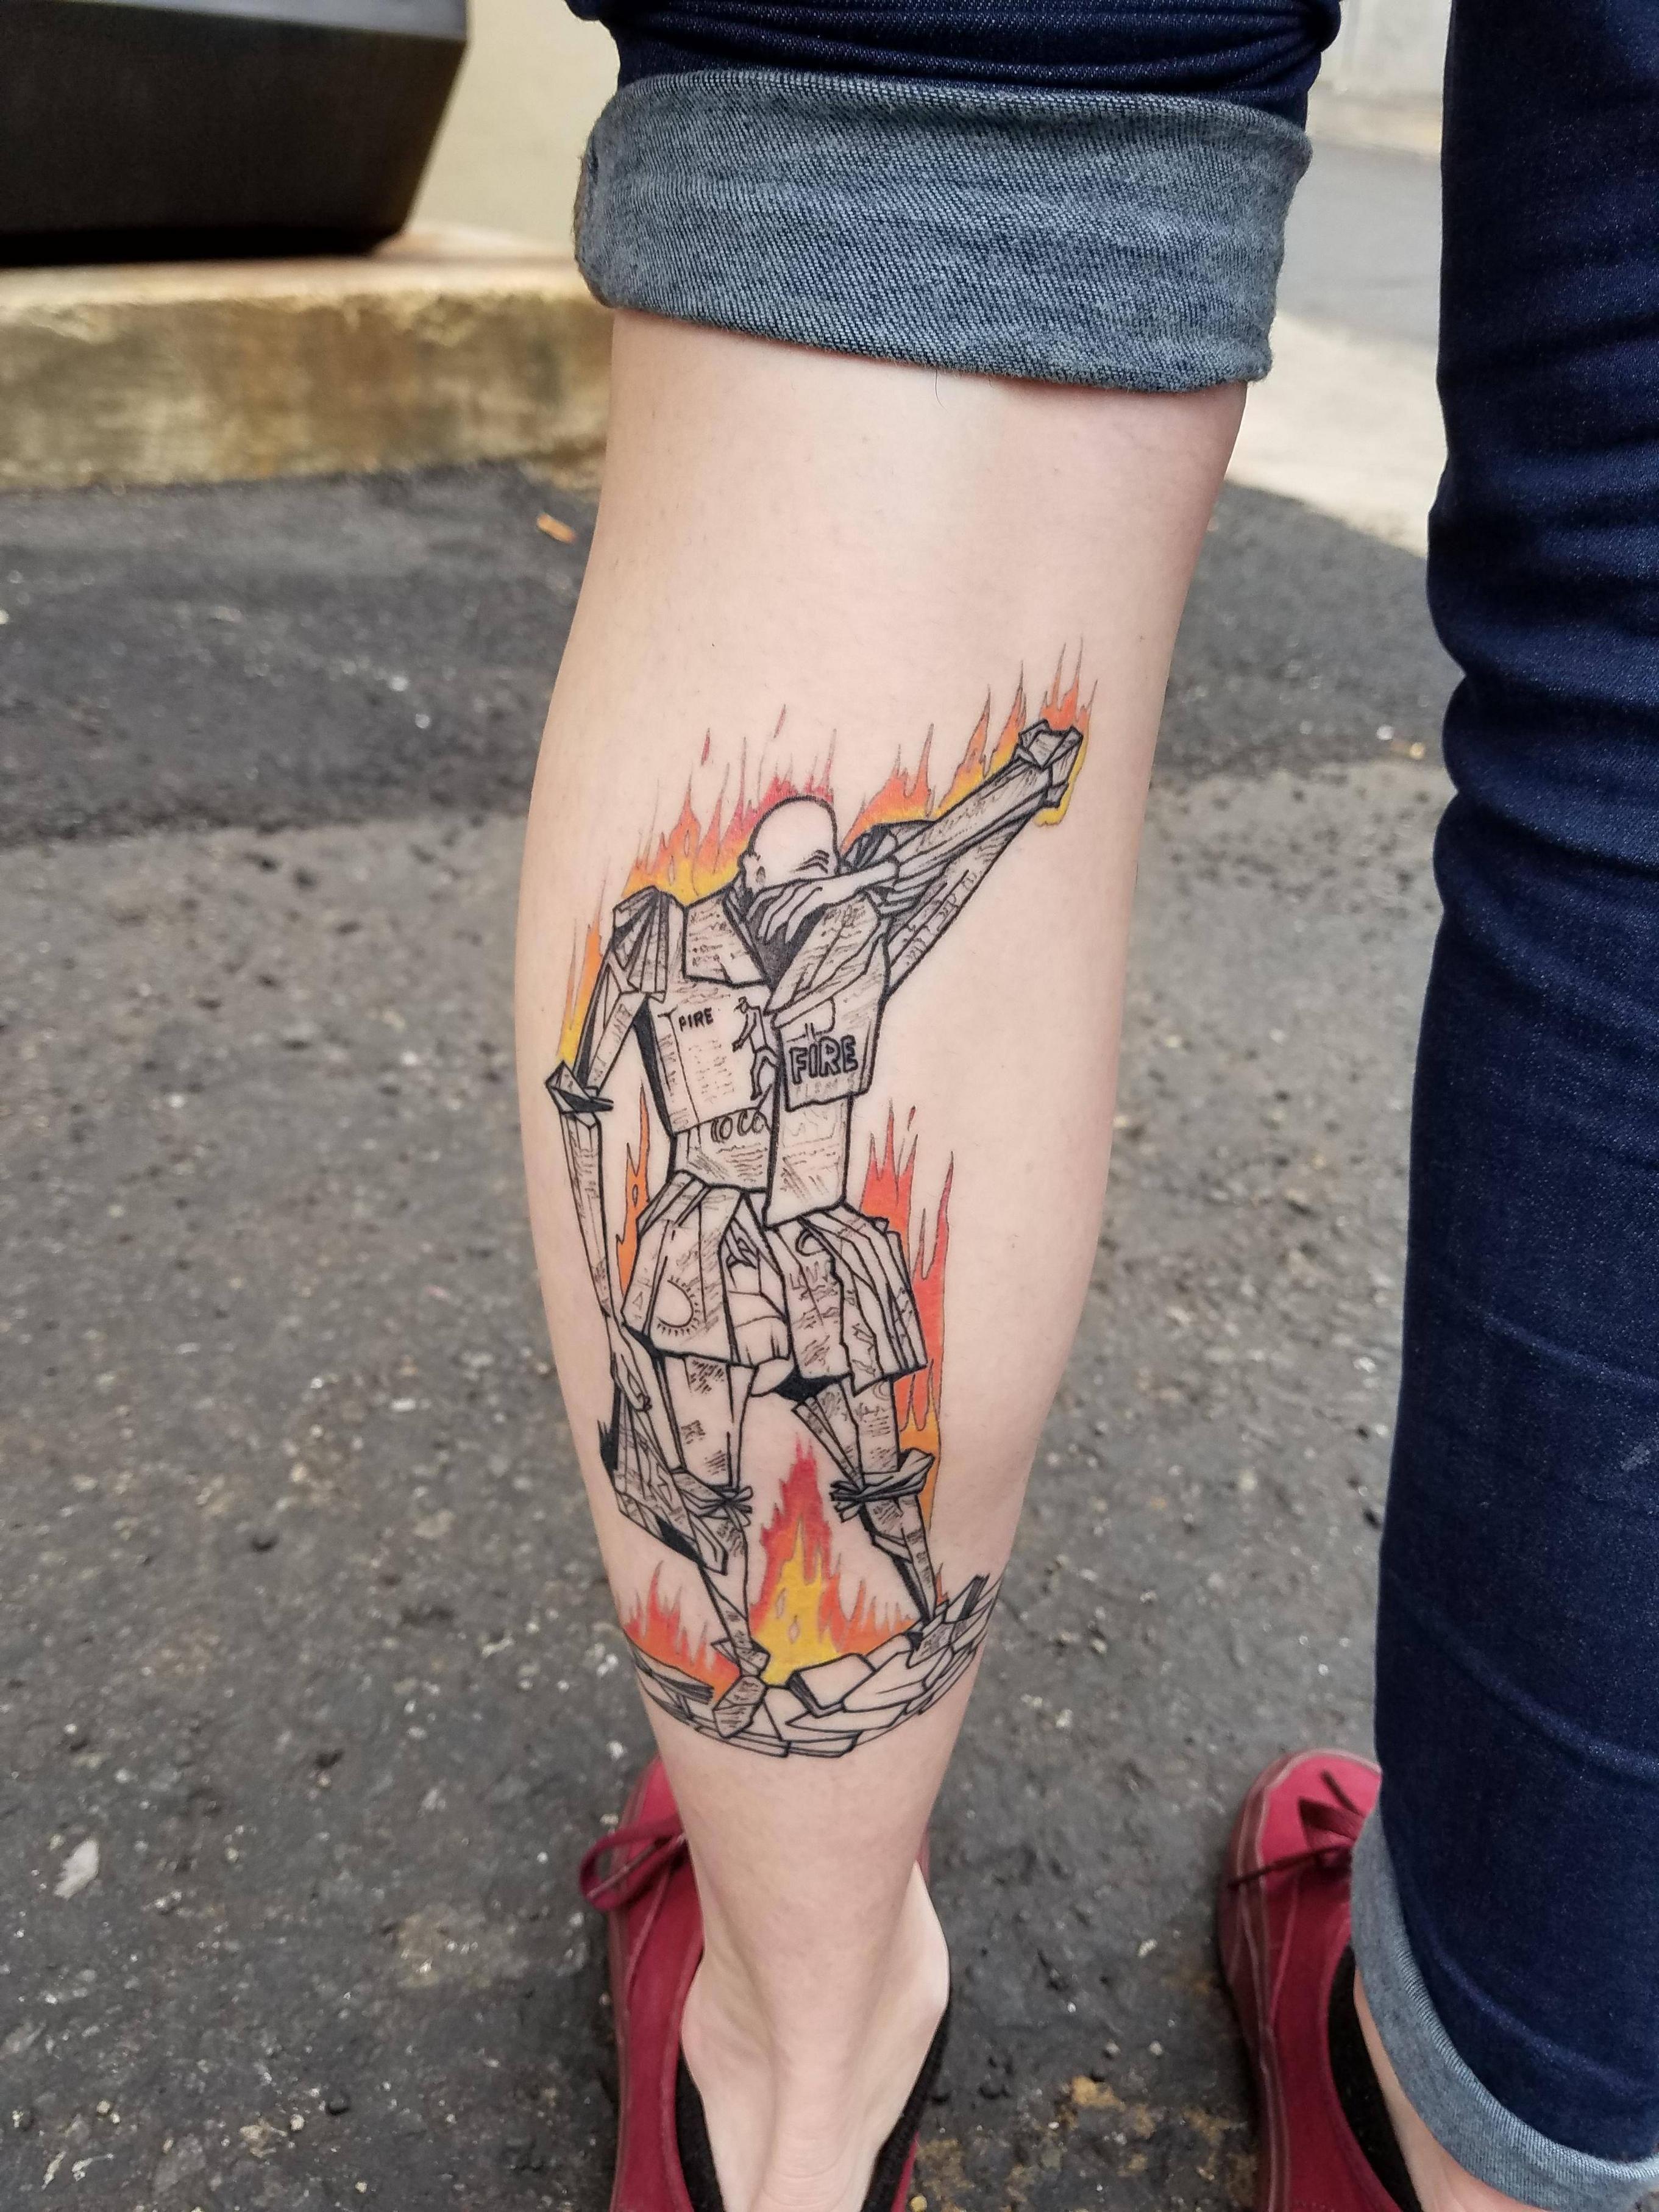 Red Rabbit Tattoo : rabbit, tattoo, Fahrenheit, Cover, Image, Rabbit, Tattoo, Asheville, Tattoos,